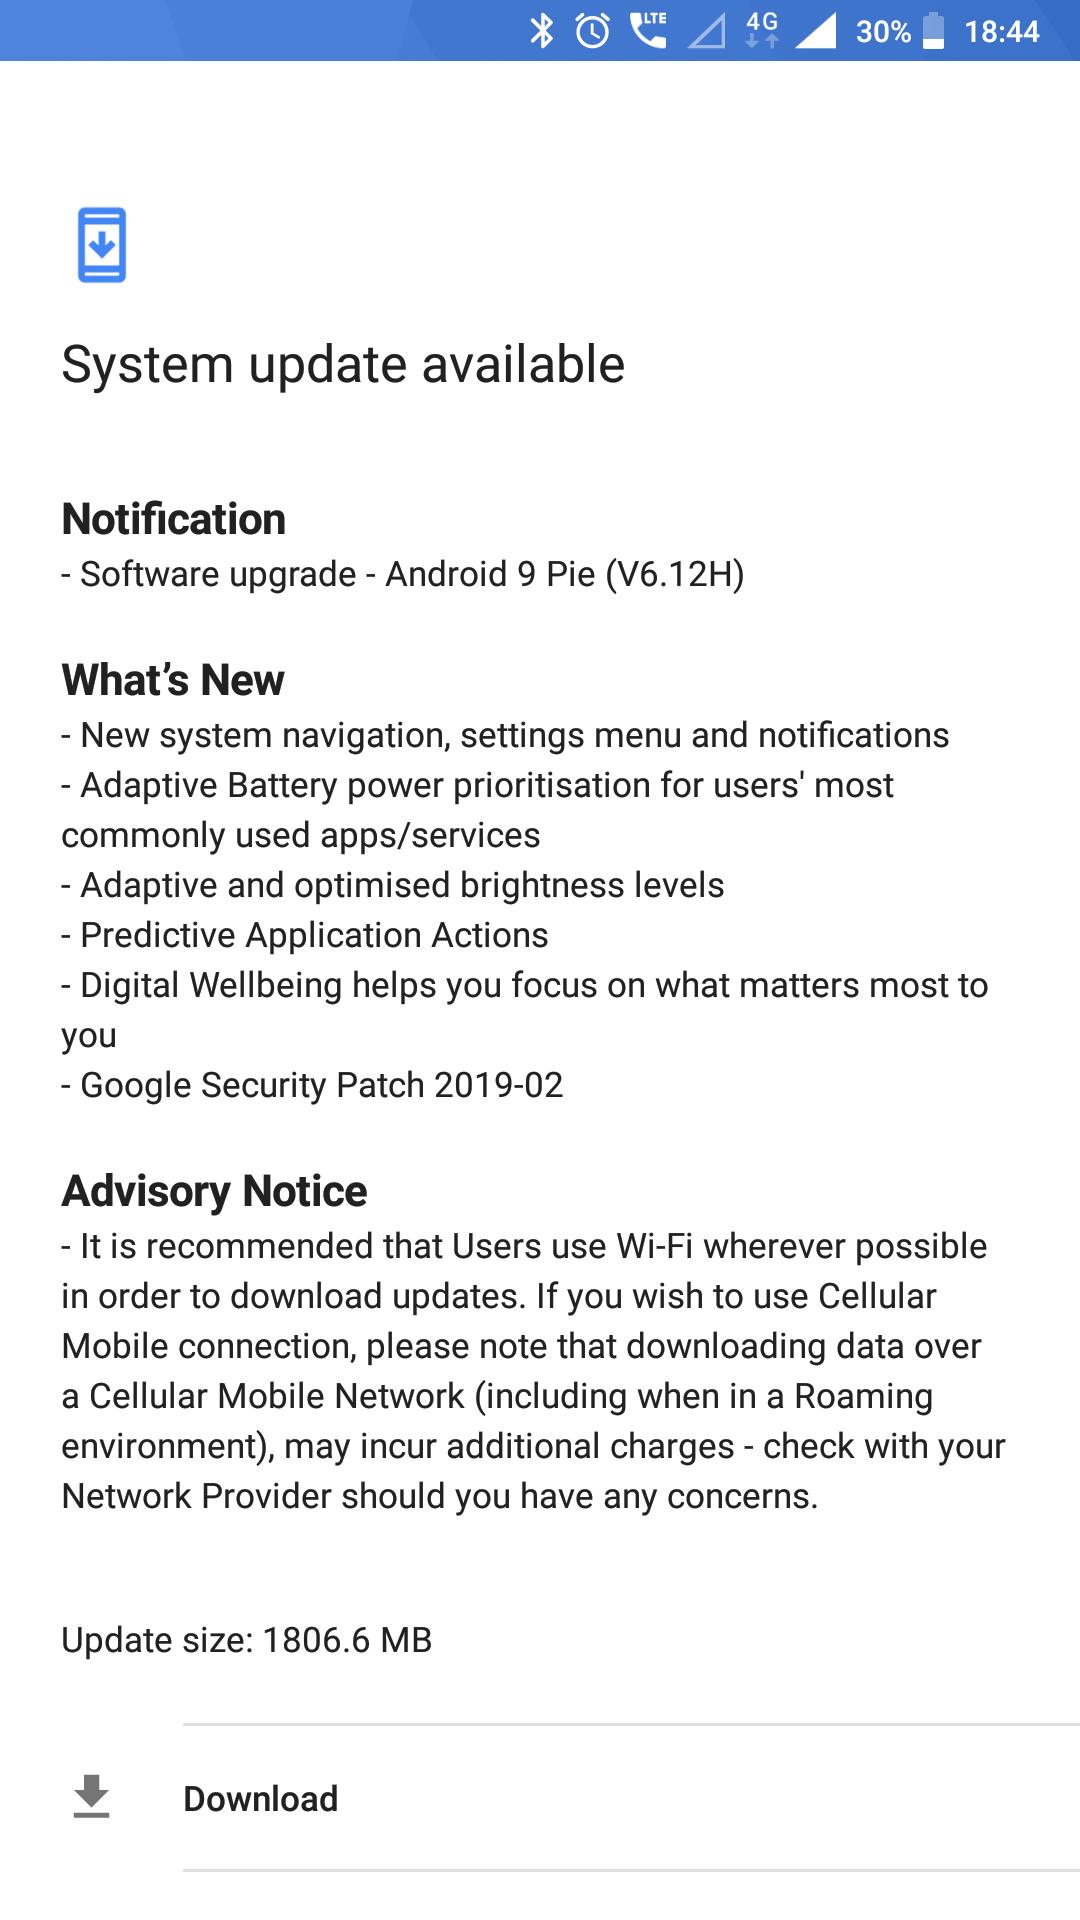 Nokia 6 Android 9 pie update Released today — Nokia phones